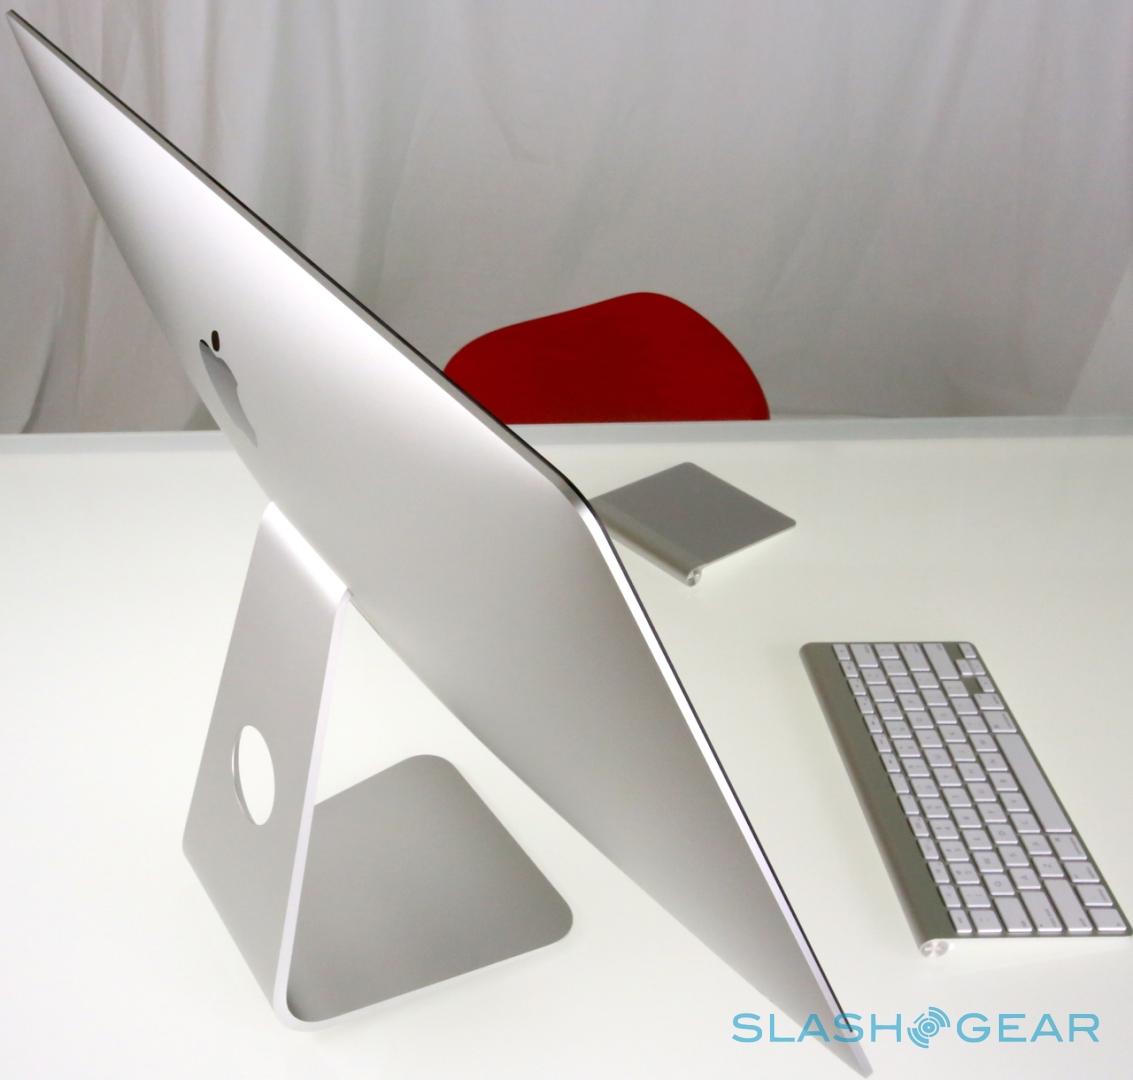 Apple iMac 27-inch (2012) Review - SlashGear